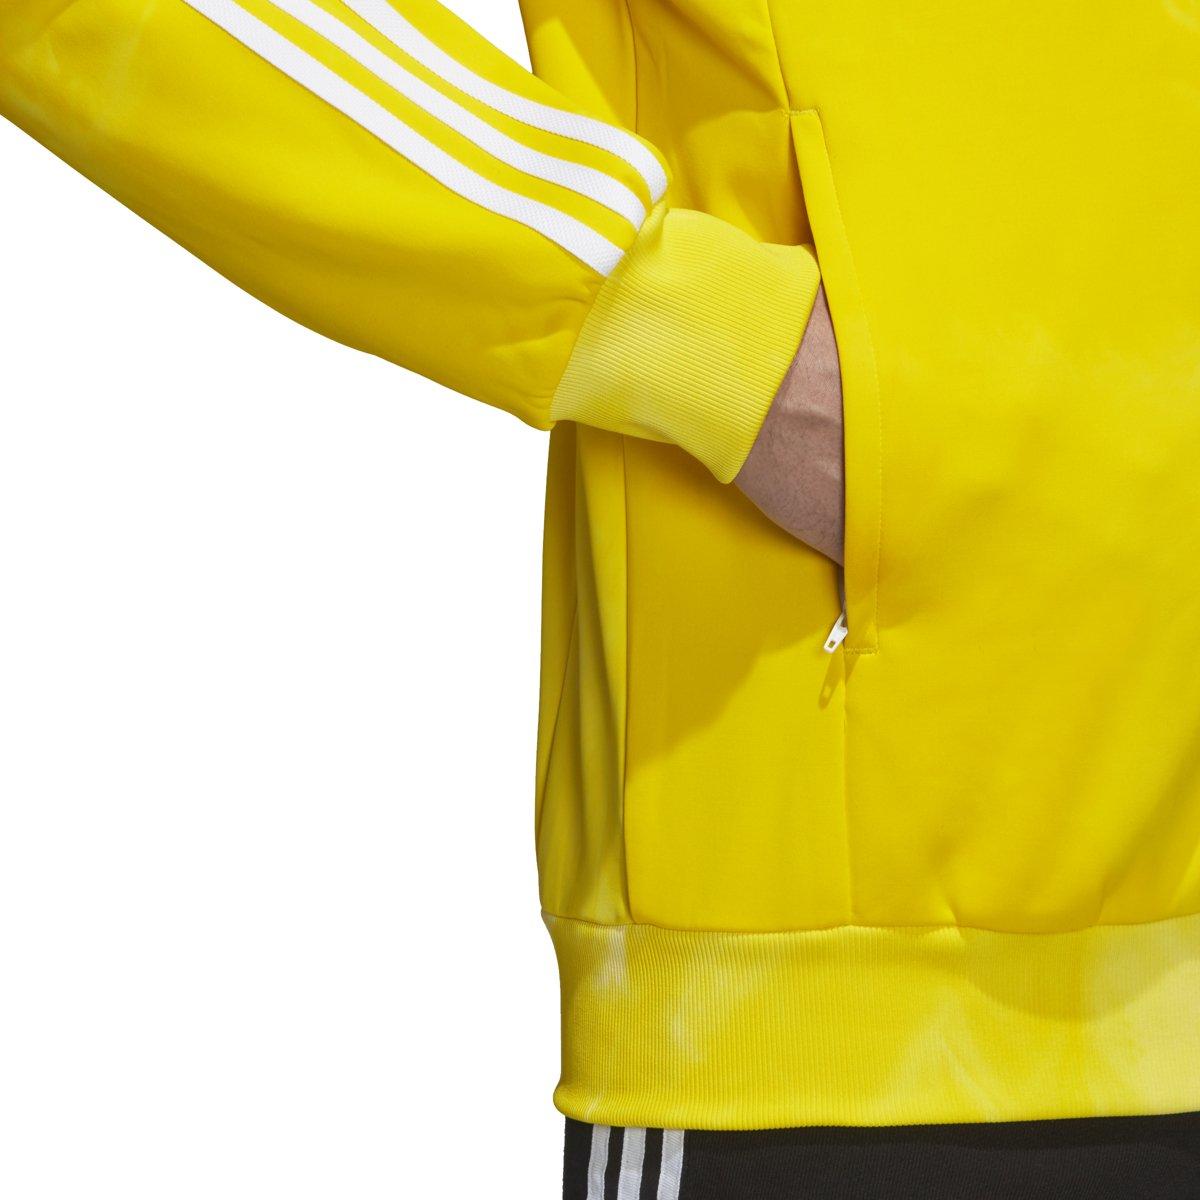 9e5662fb0 adidas Men s Originals Pharrell Williams hu Holi SST Track Jacket CW9103 at  Amazon Men s Clothing store